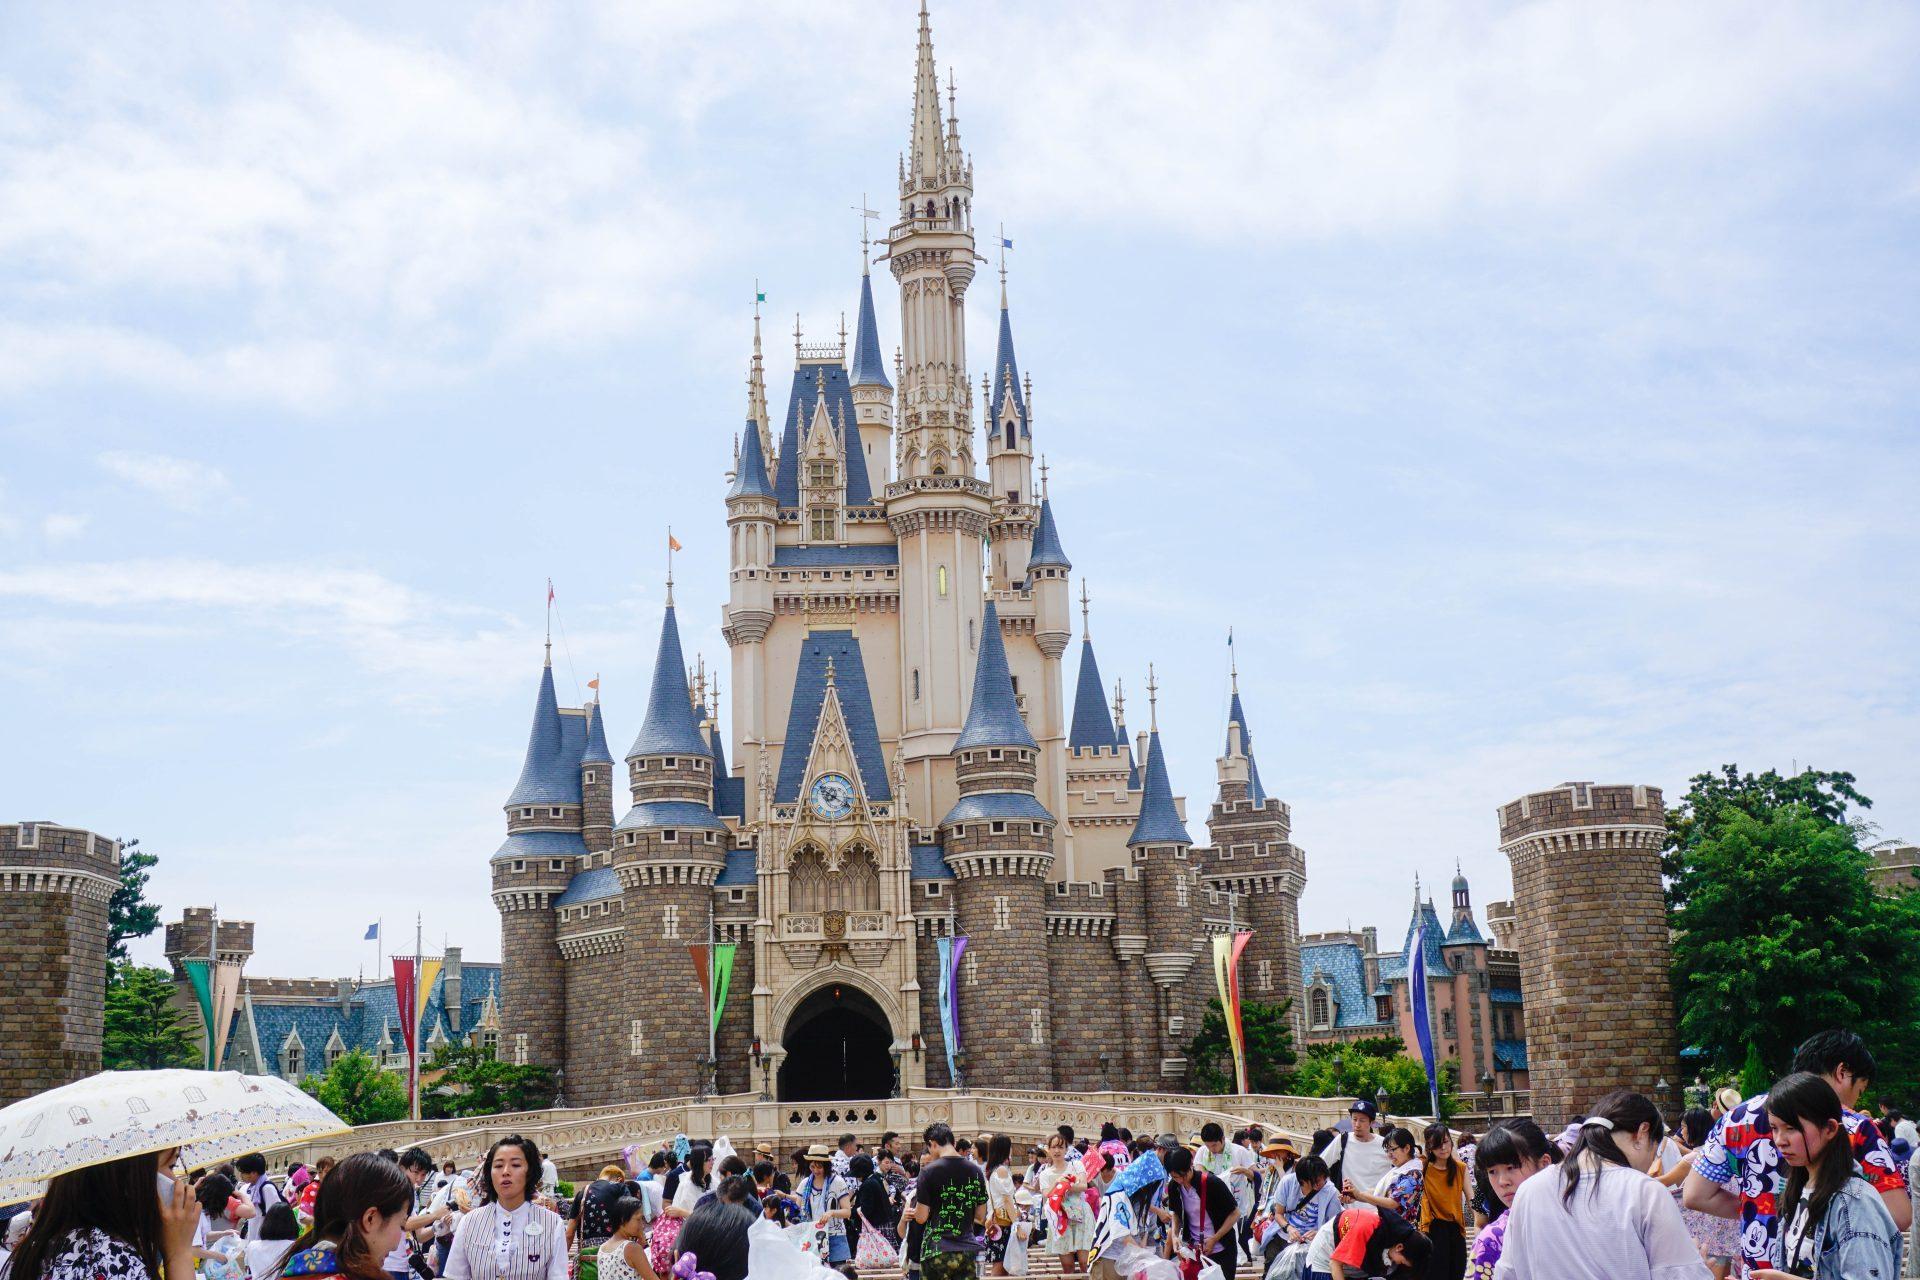 central-castle-icon-disneyland-tokyo-japan-thebroadlife-travel-wanderlust-asia